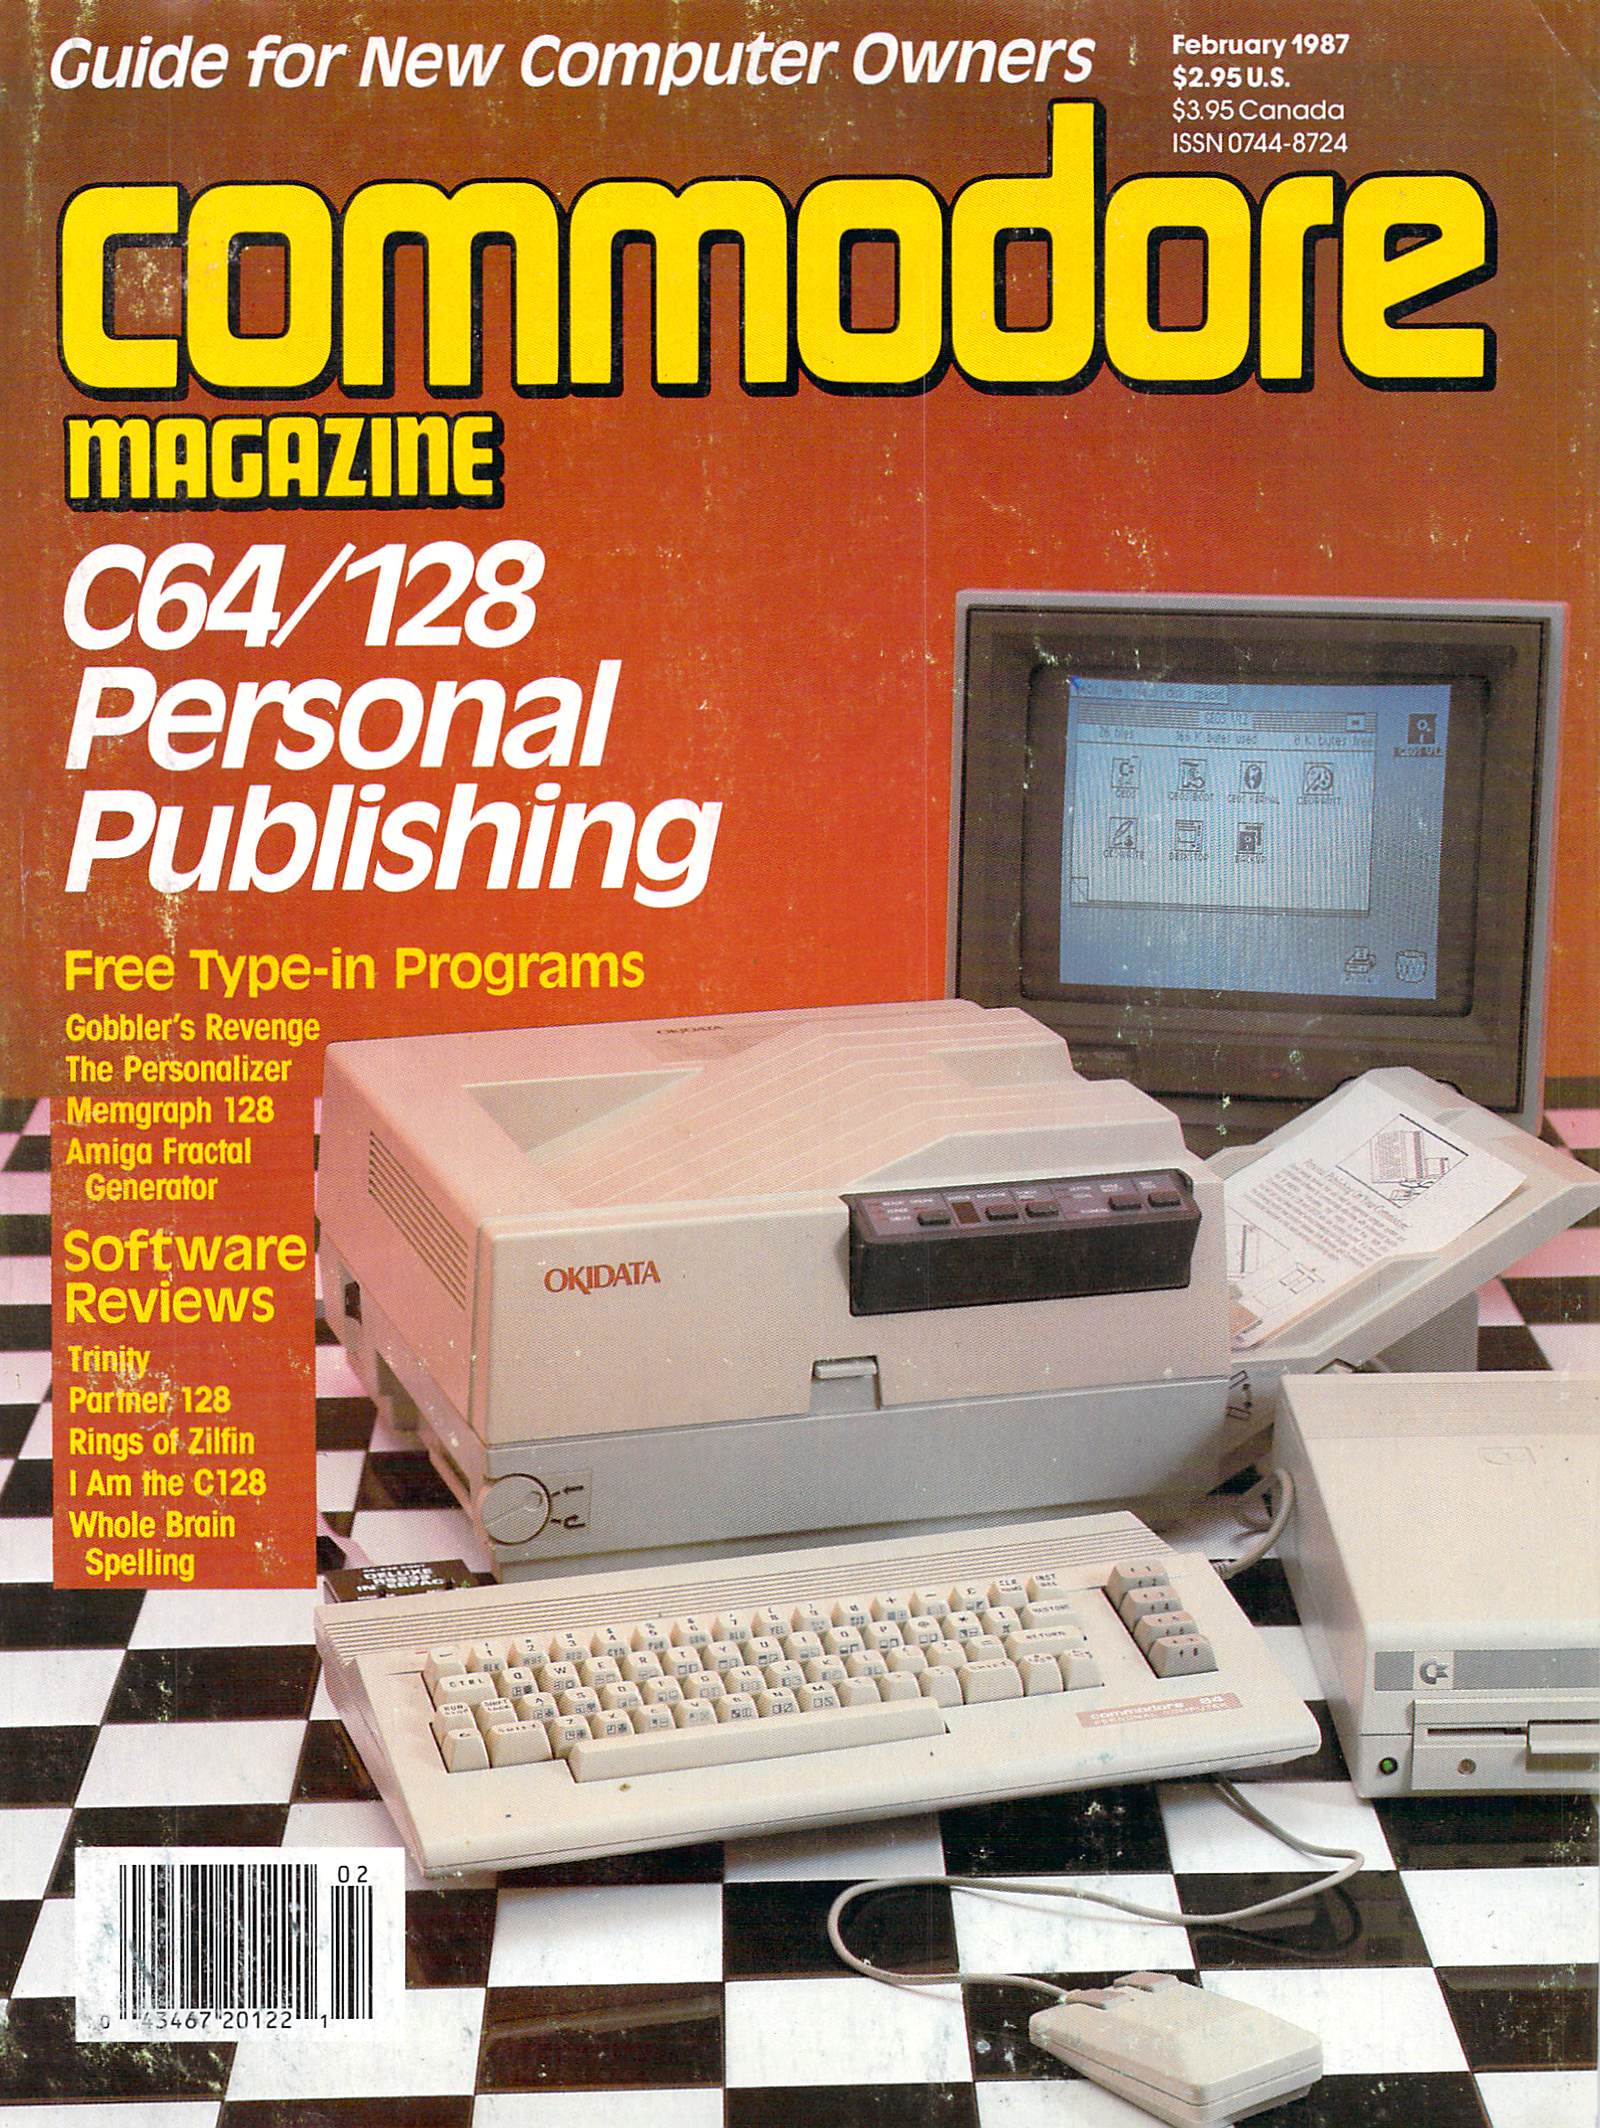 commodore_magazine_vol-08-n02_1987_feb-001